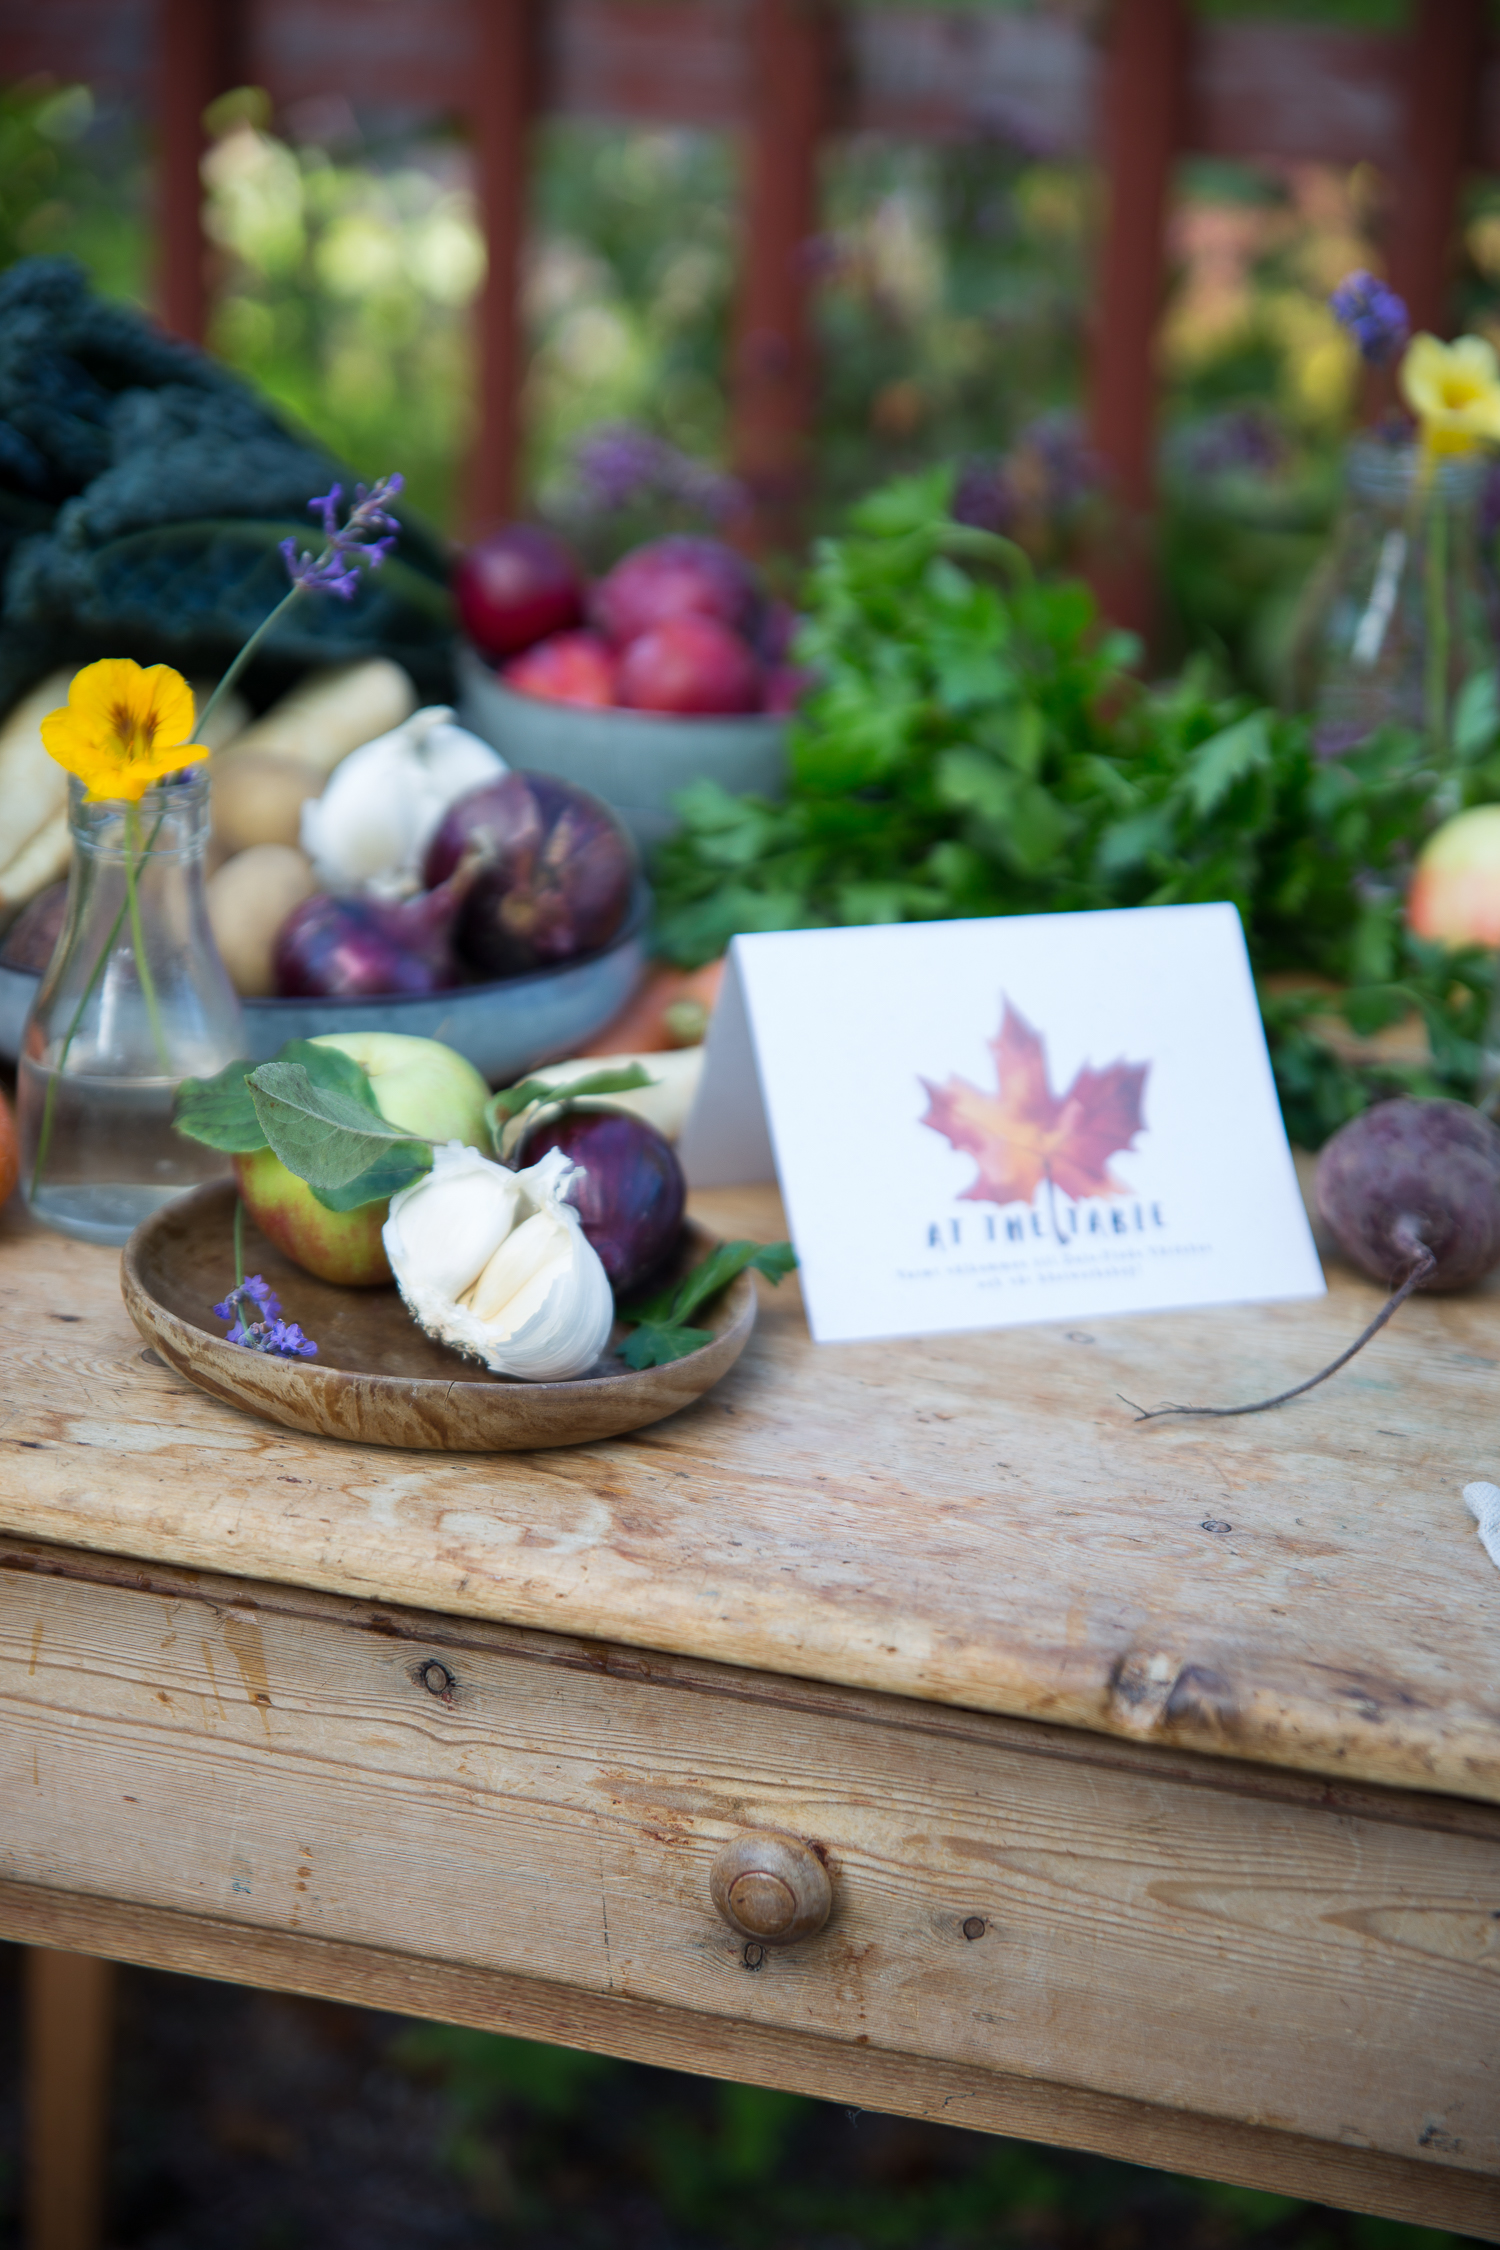 At the table, workshop in Dala-Floda, Sweden   Cashew Kitchen